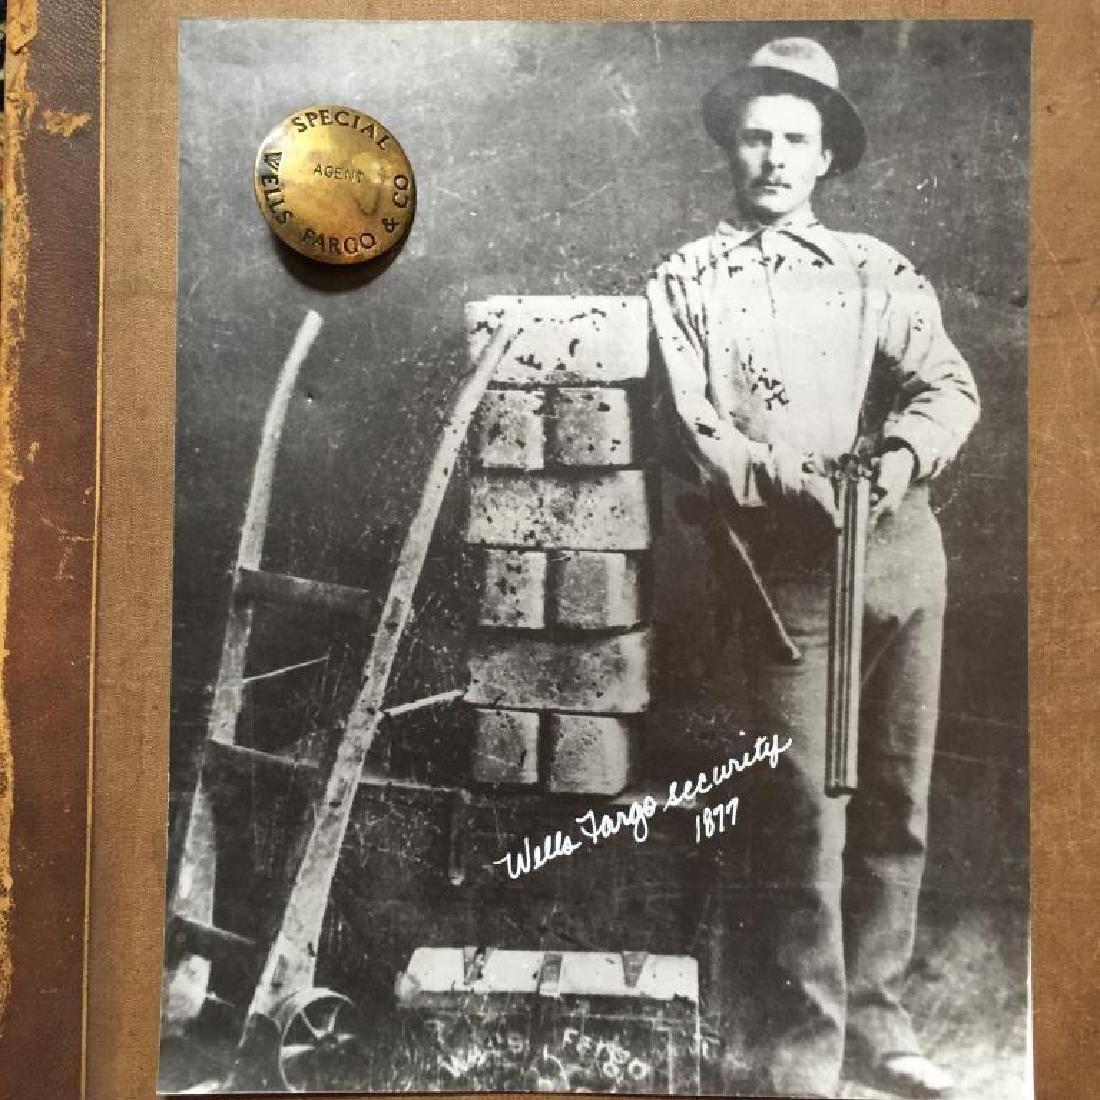 Wells Fargo Special Agent Badge Photo Set